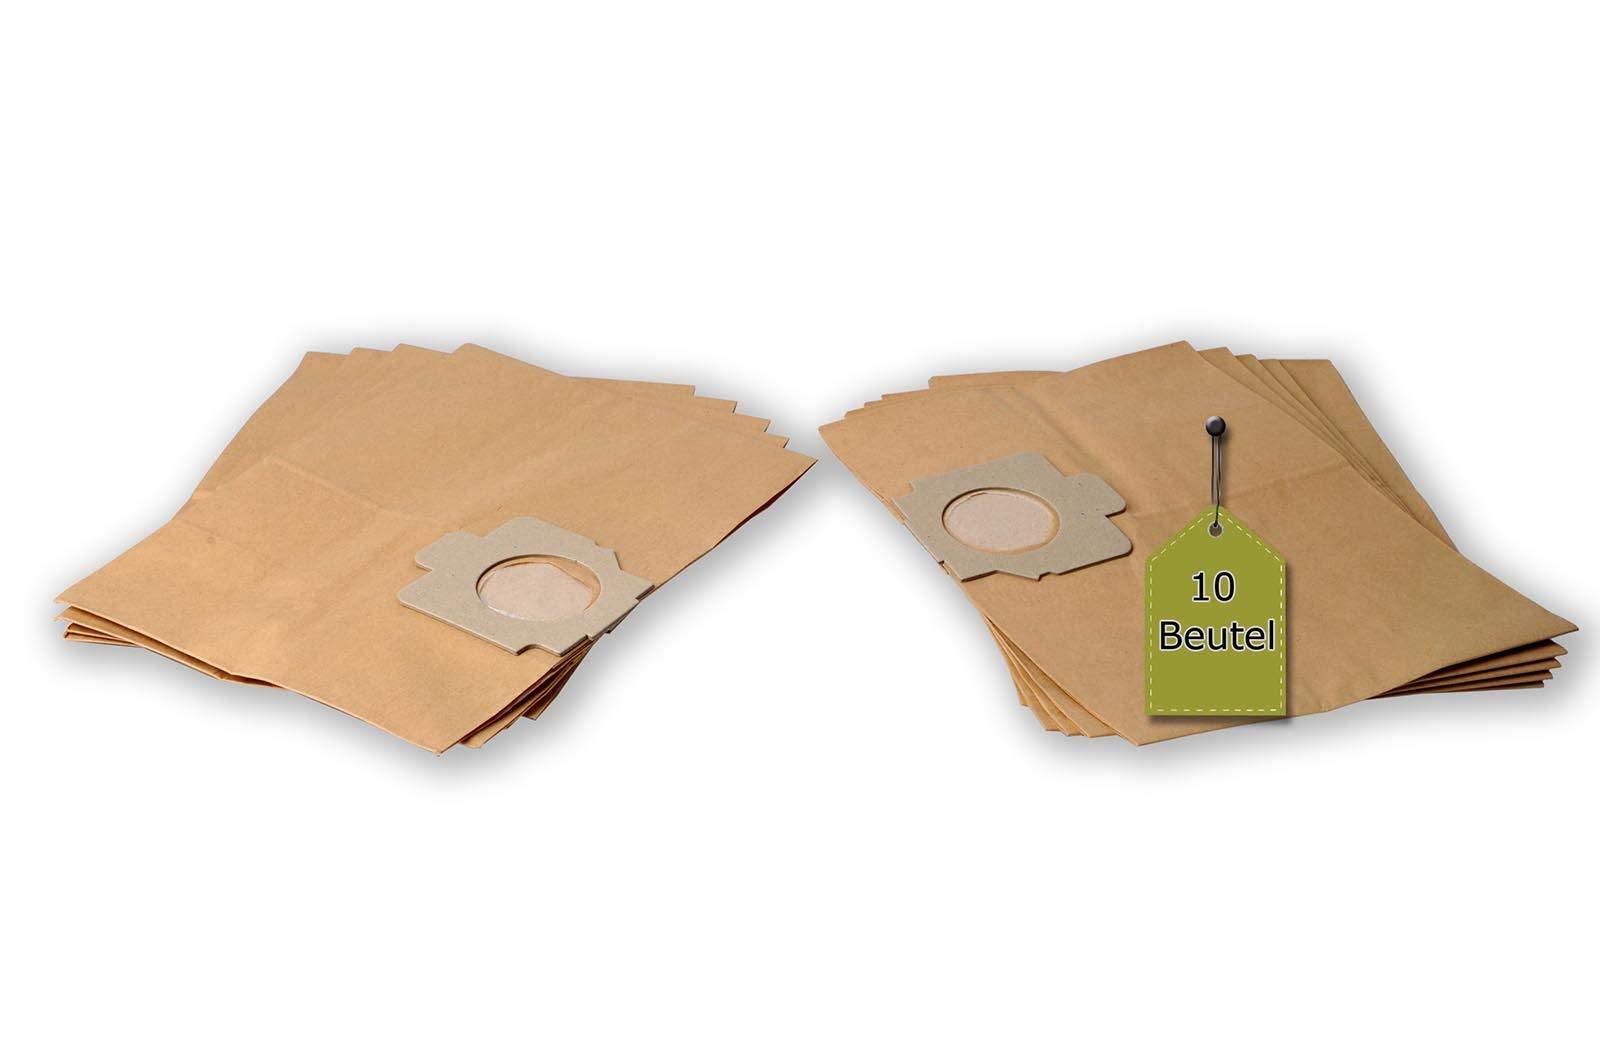 20 Bolsas para aspiradora Moulinex 1000 SL – Solo Classic de serie. | 2 capas de papel Bolsa para el polvo de microfibras® (similar a original de bolsa tipo: 847, B 45) 10 bolsas de basura: Amazon.es: Hogar